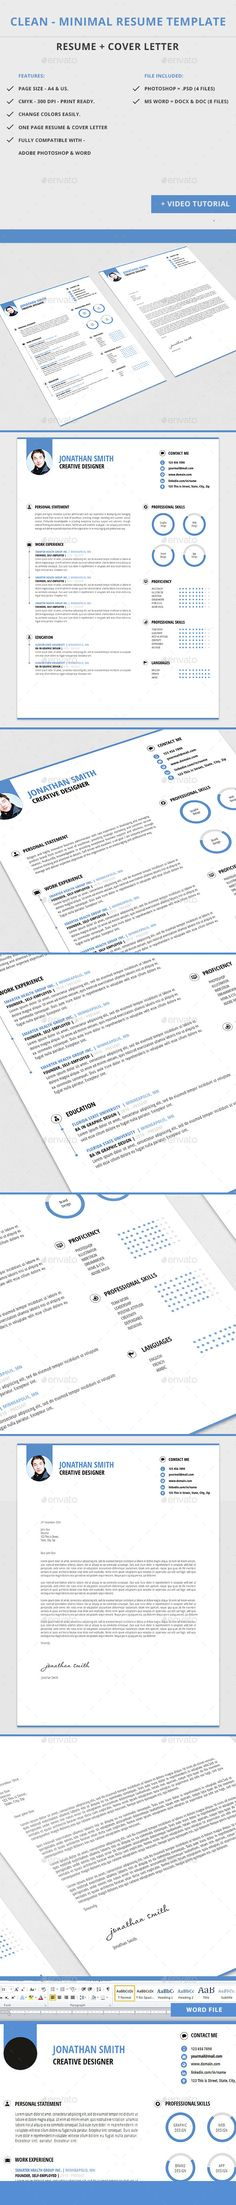 Modern Resume Template Modern resume template, Modern resume and - executive resume templates word